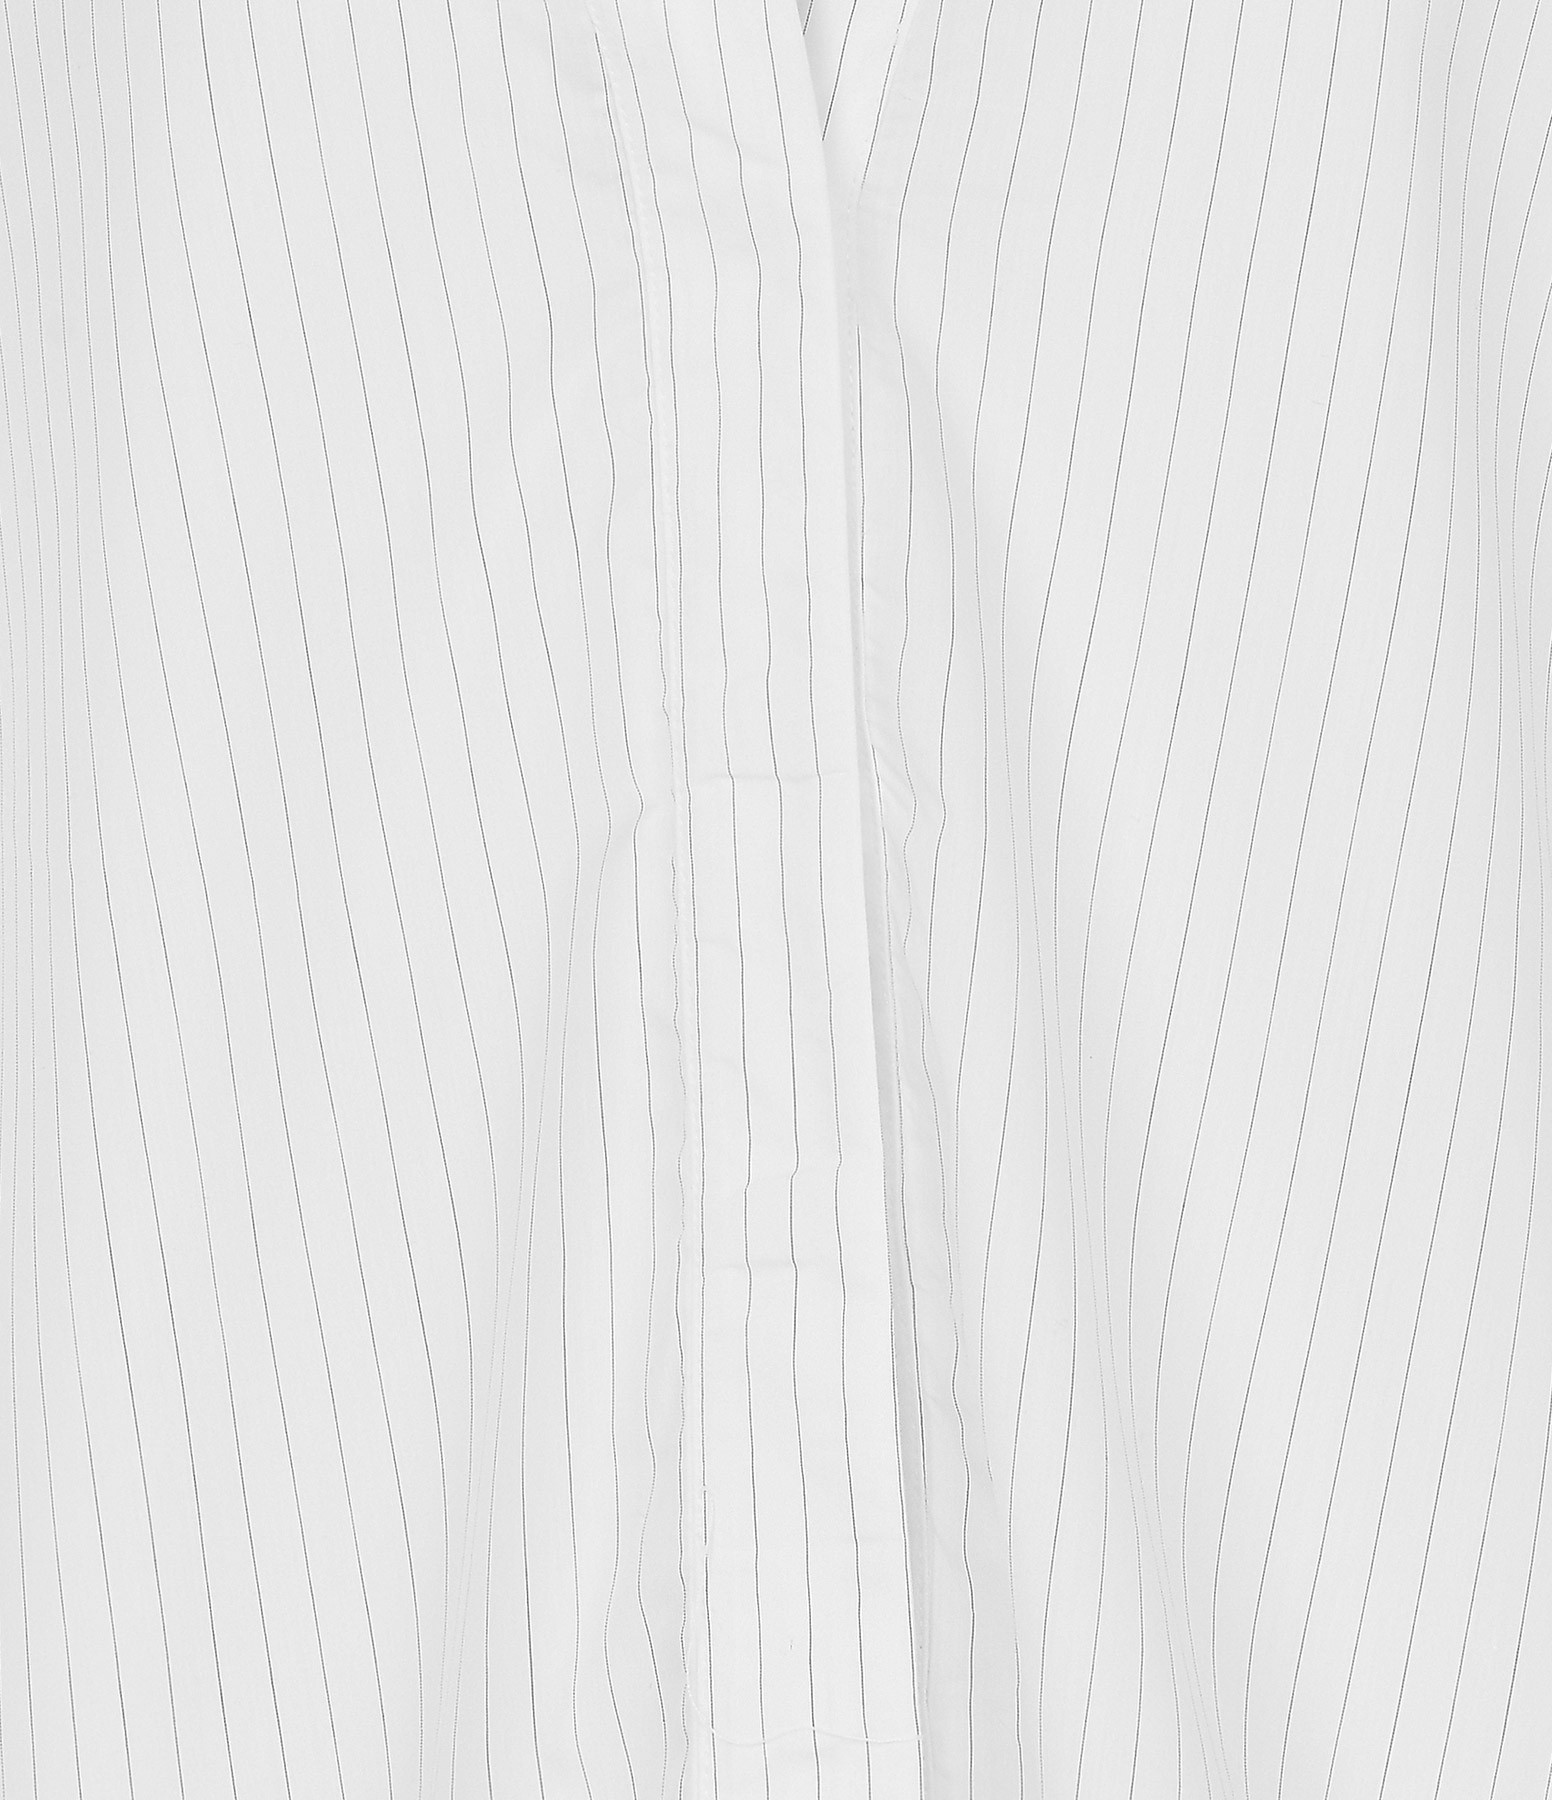 MARGAUX LONNBERG - Chemise Lisa Rayures Noir